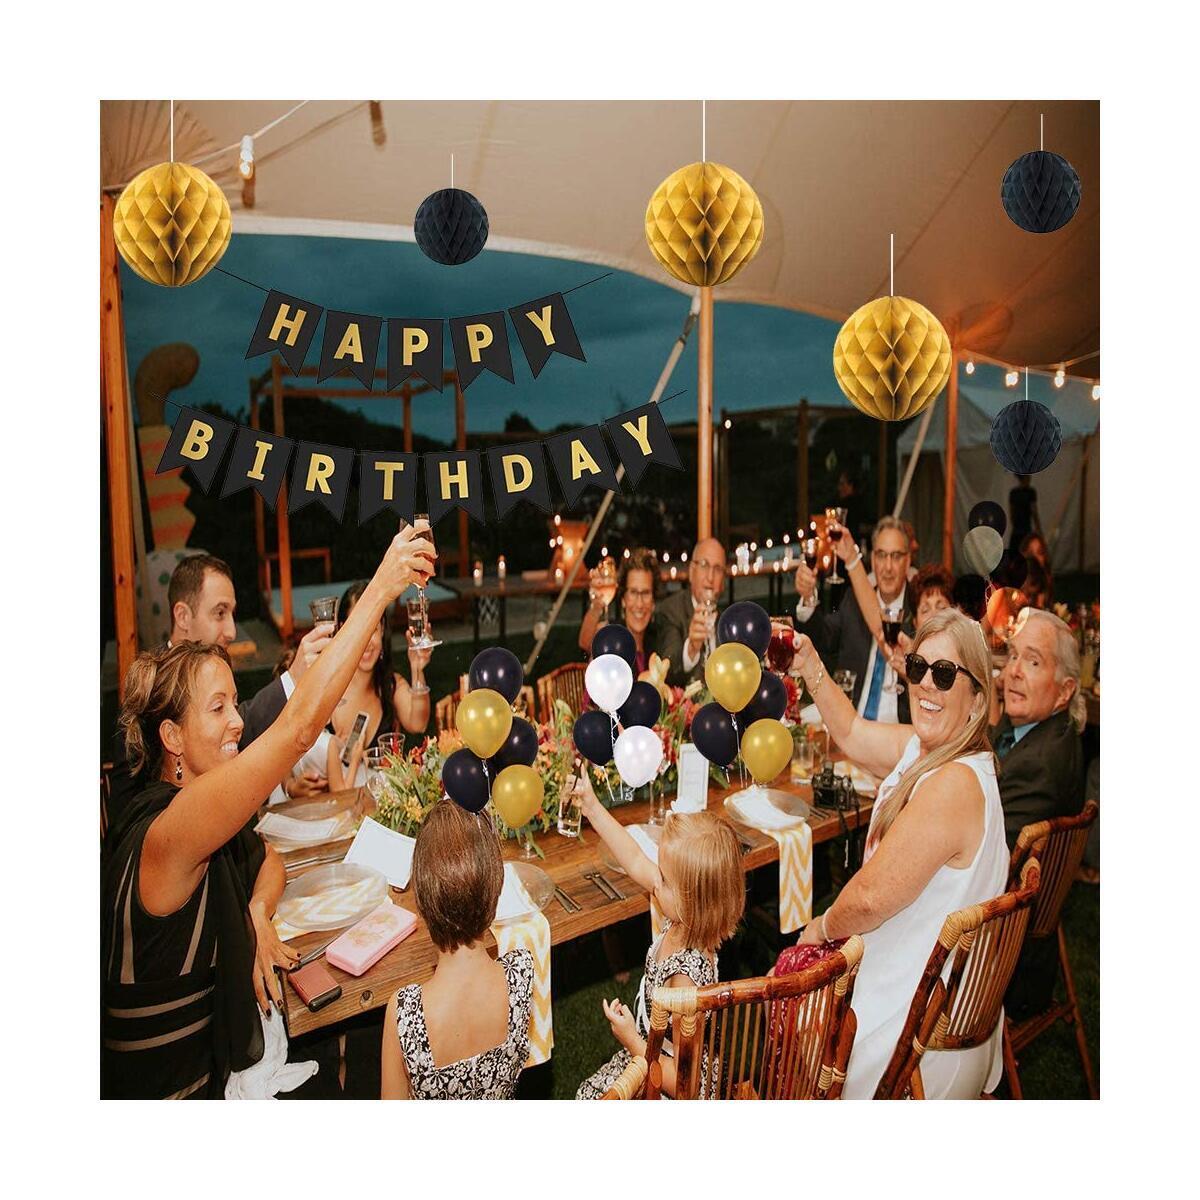 BOSCORD Birthday Decorations, Black and Gold Birthday Surprises for Men,Women, Elderly, Retired and Graduation, Black Happy Birthday Banners,Birthday Balloons, for 30th 40th 50th 60th 70th Birthday